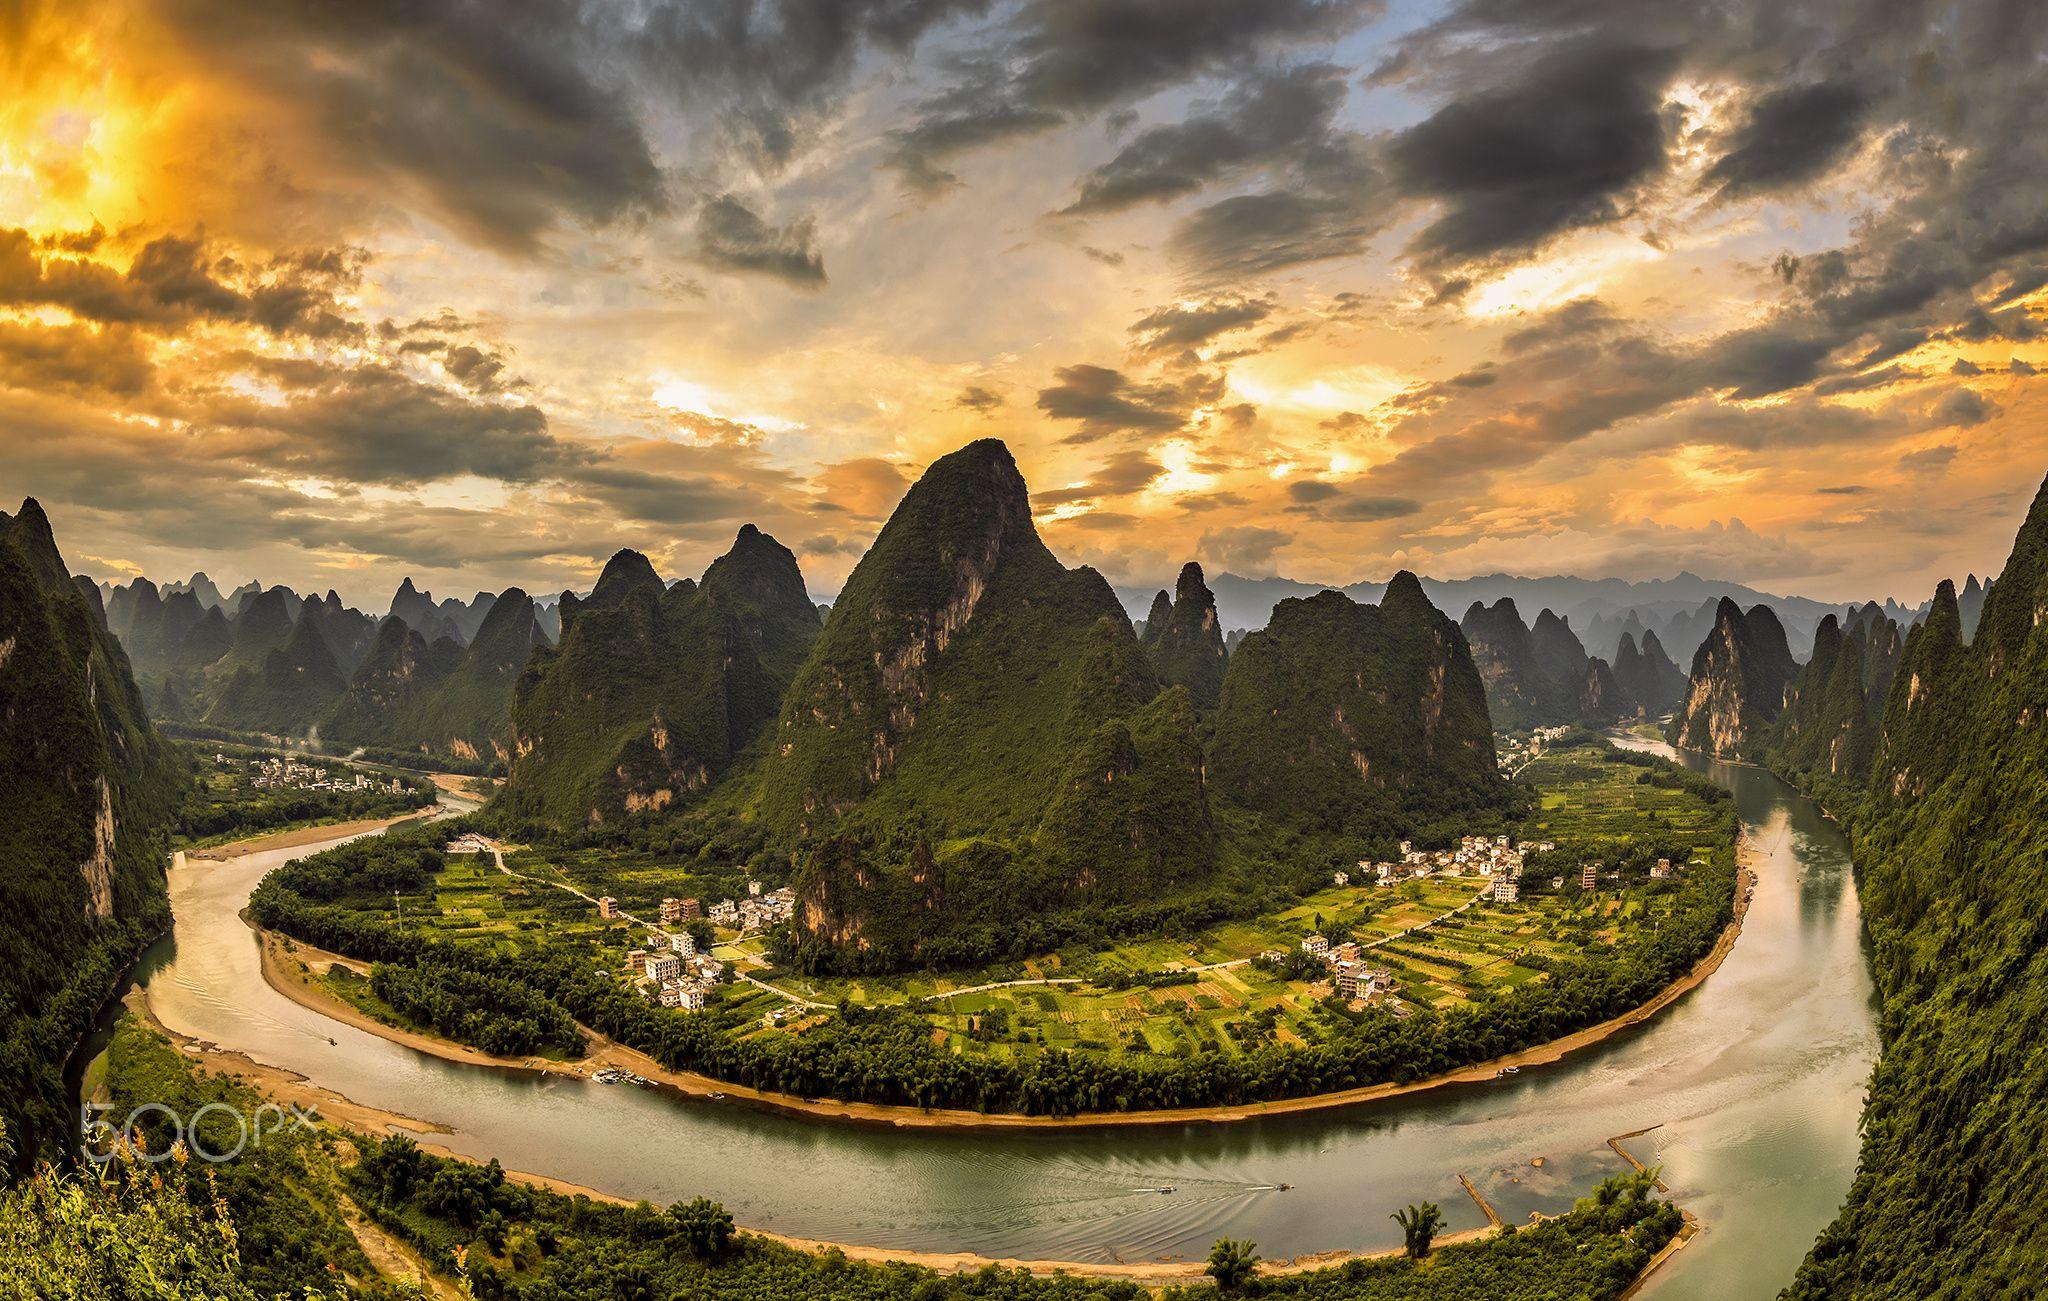 xianggong hill guilin china - landscape